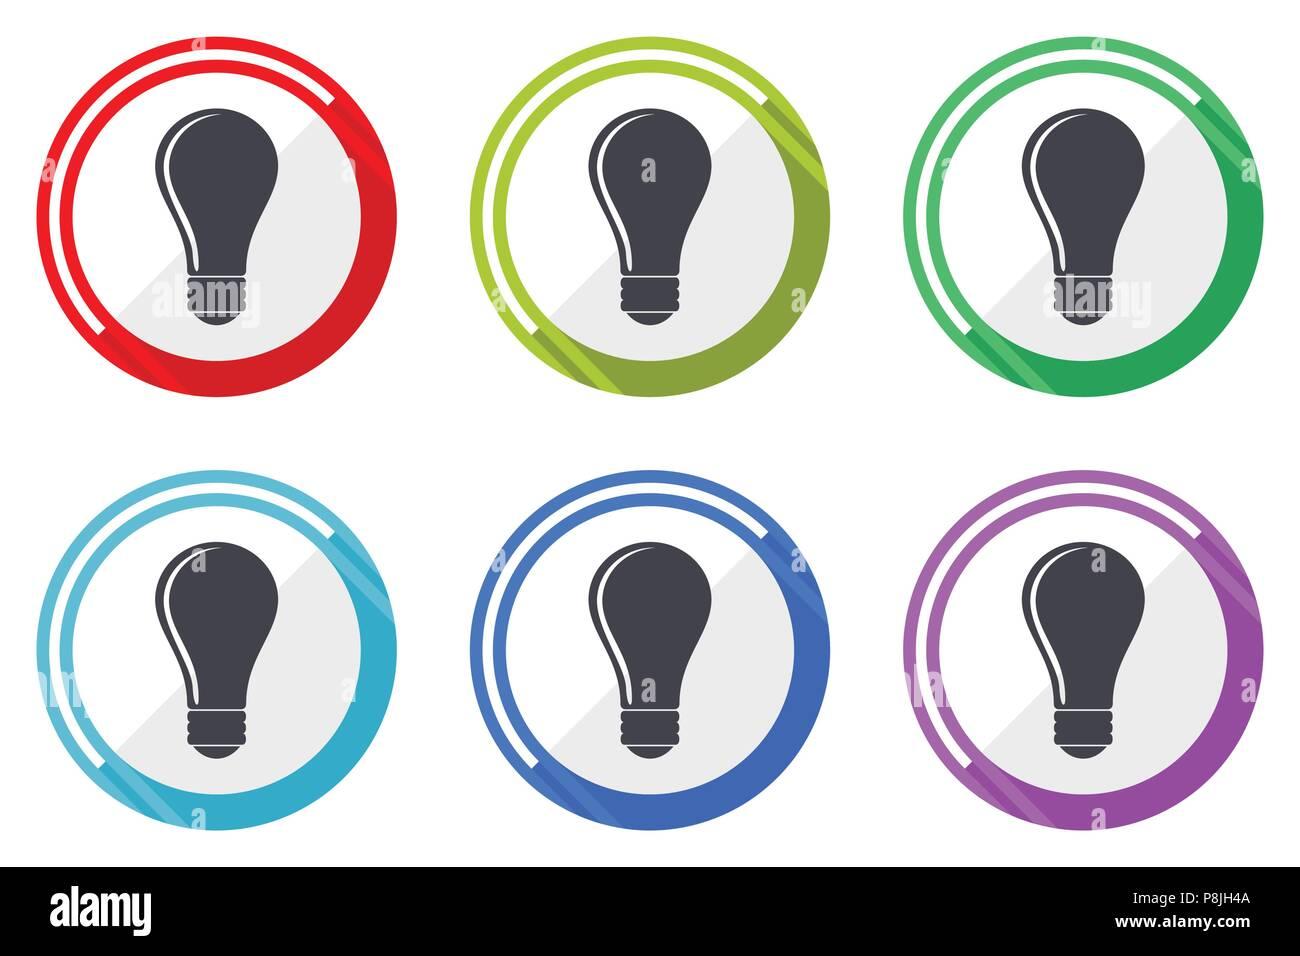 Bulb Vector Icons Set Of Colorful Flat Design Internet Symbols On